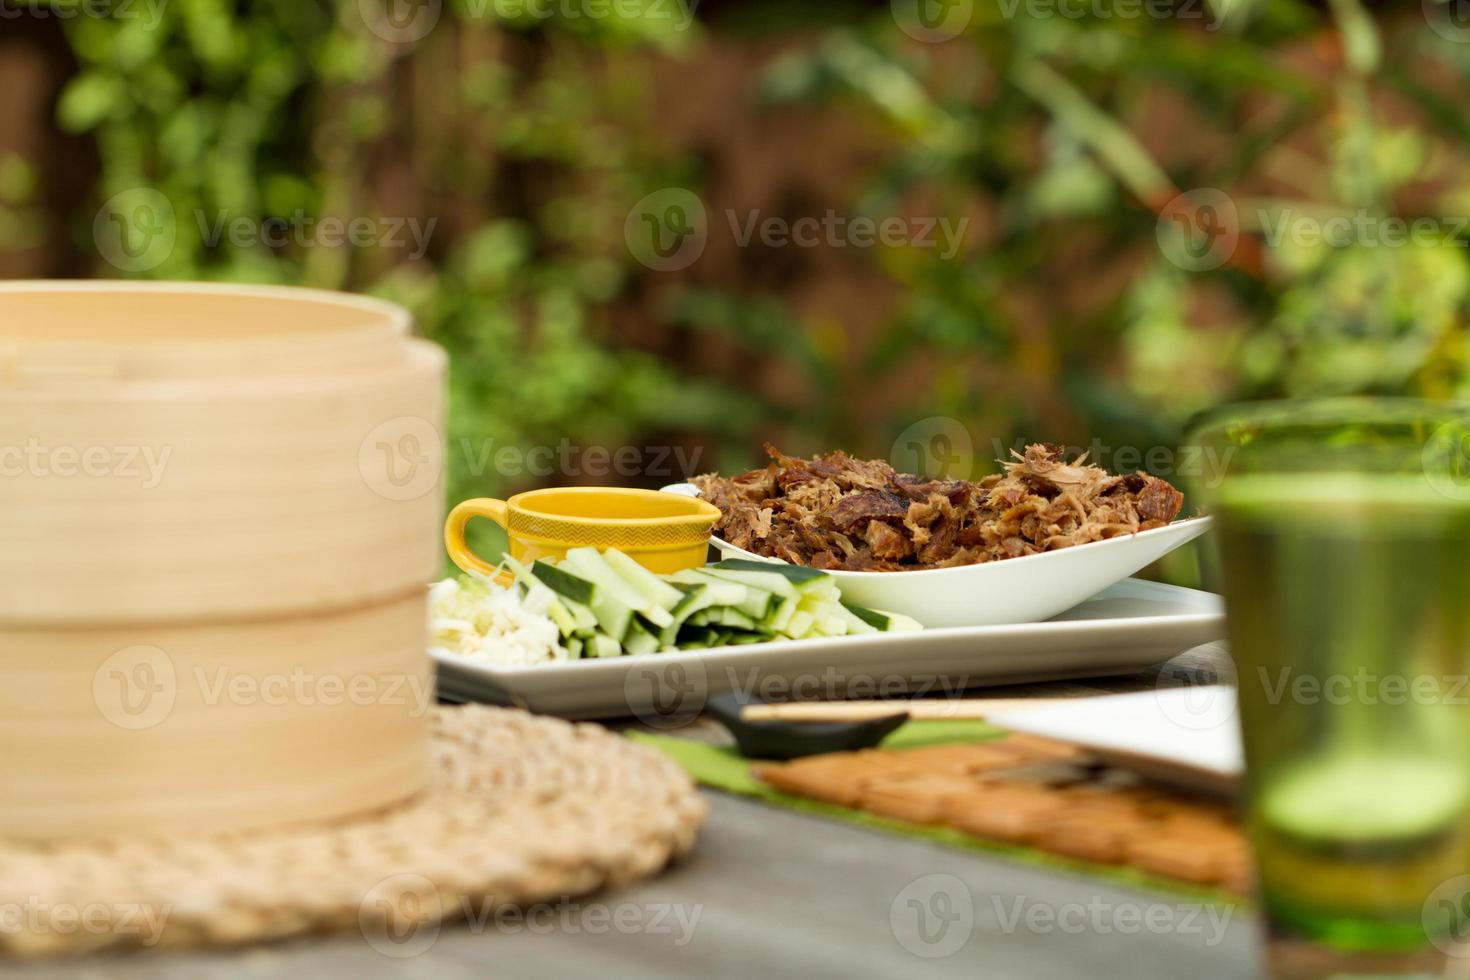 canard chinois aromatique croustillant en plein air photo